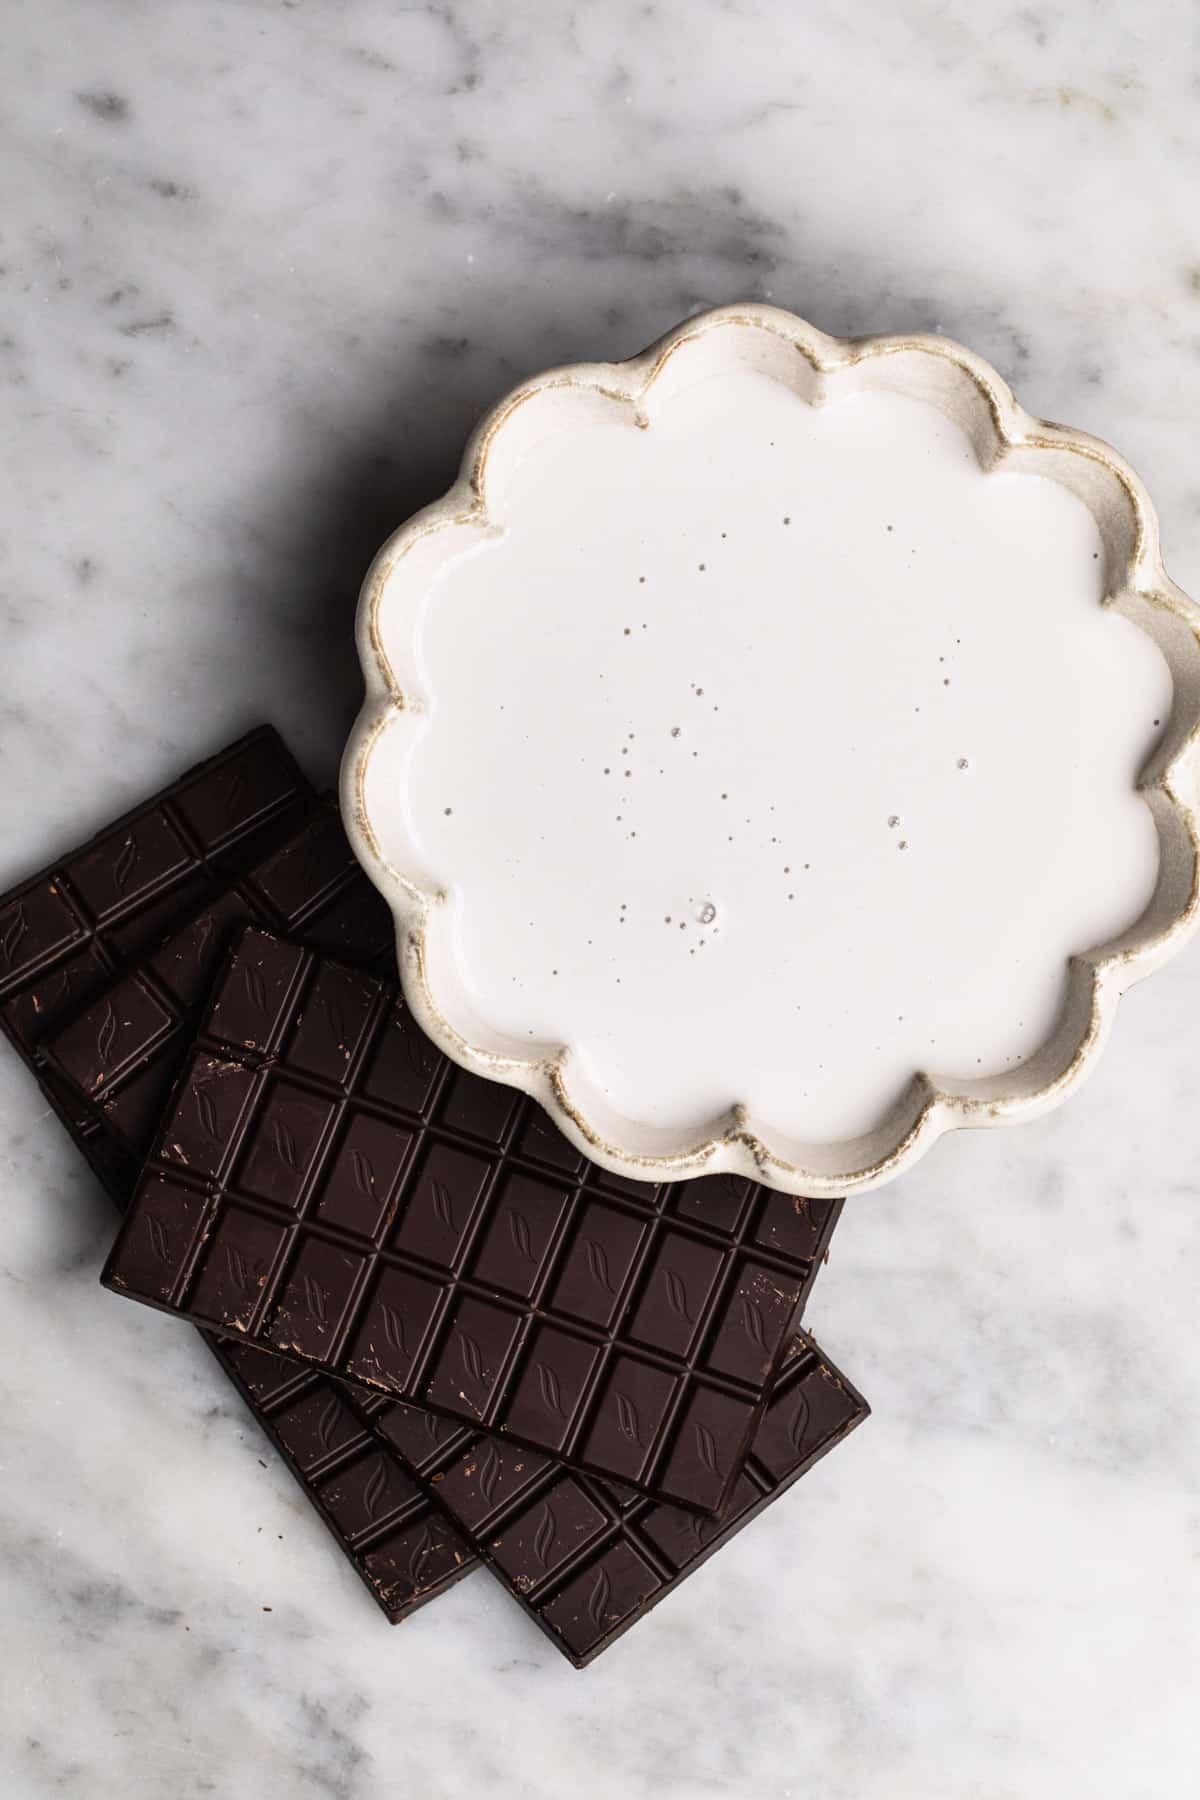 ingredients for vegan chocolate ganache